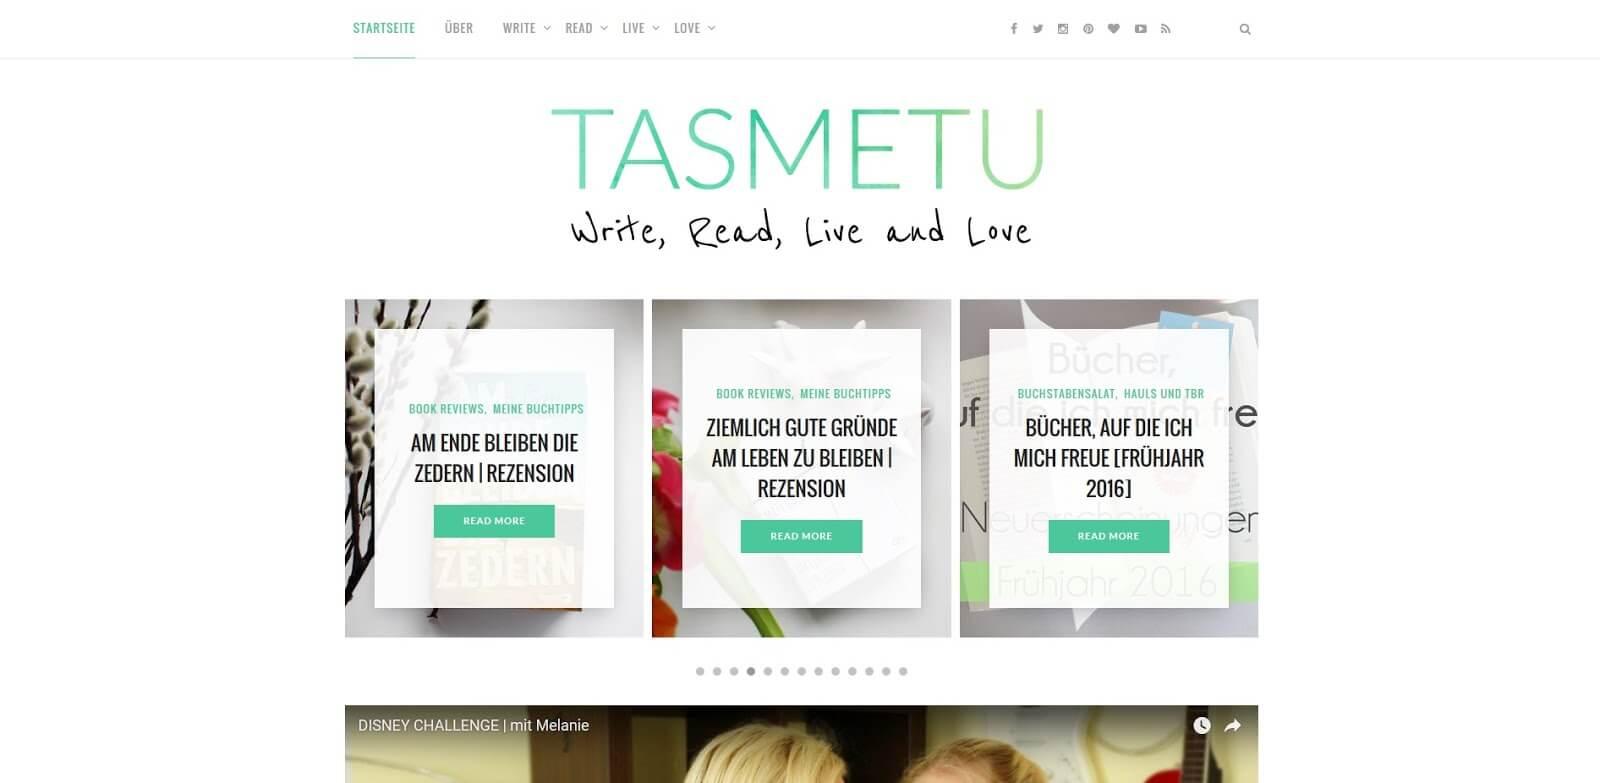 Tasmetu Blogempfehlung